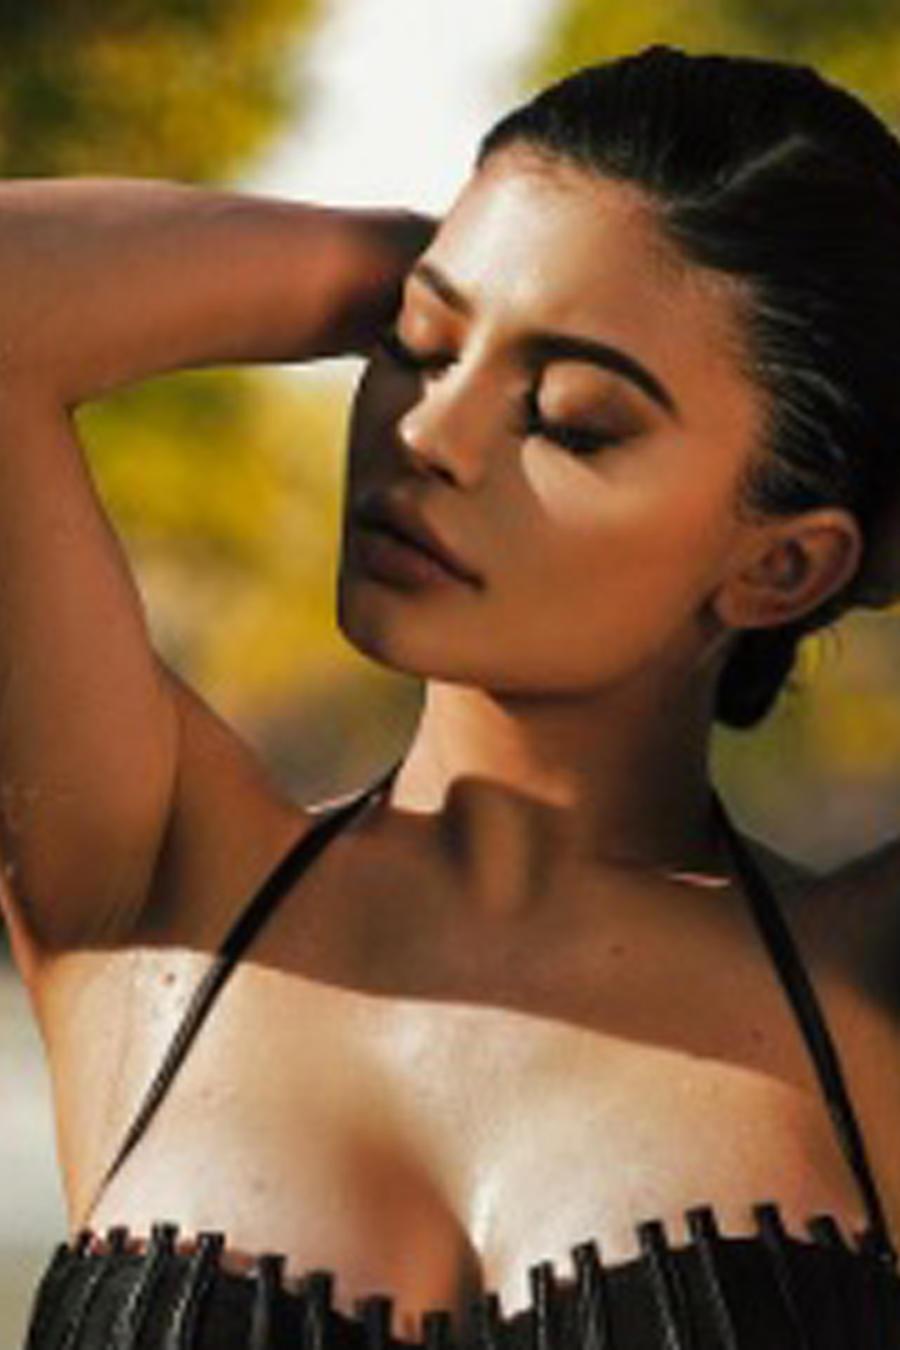 Kylie Jenner en traje de baño transparente